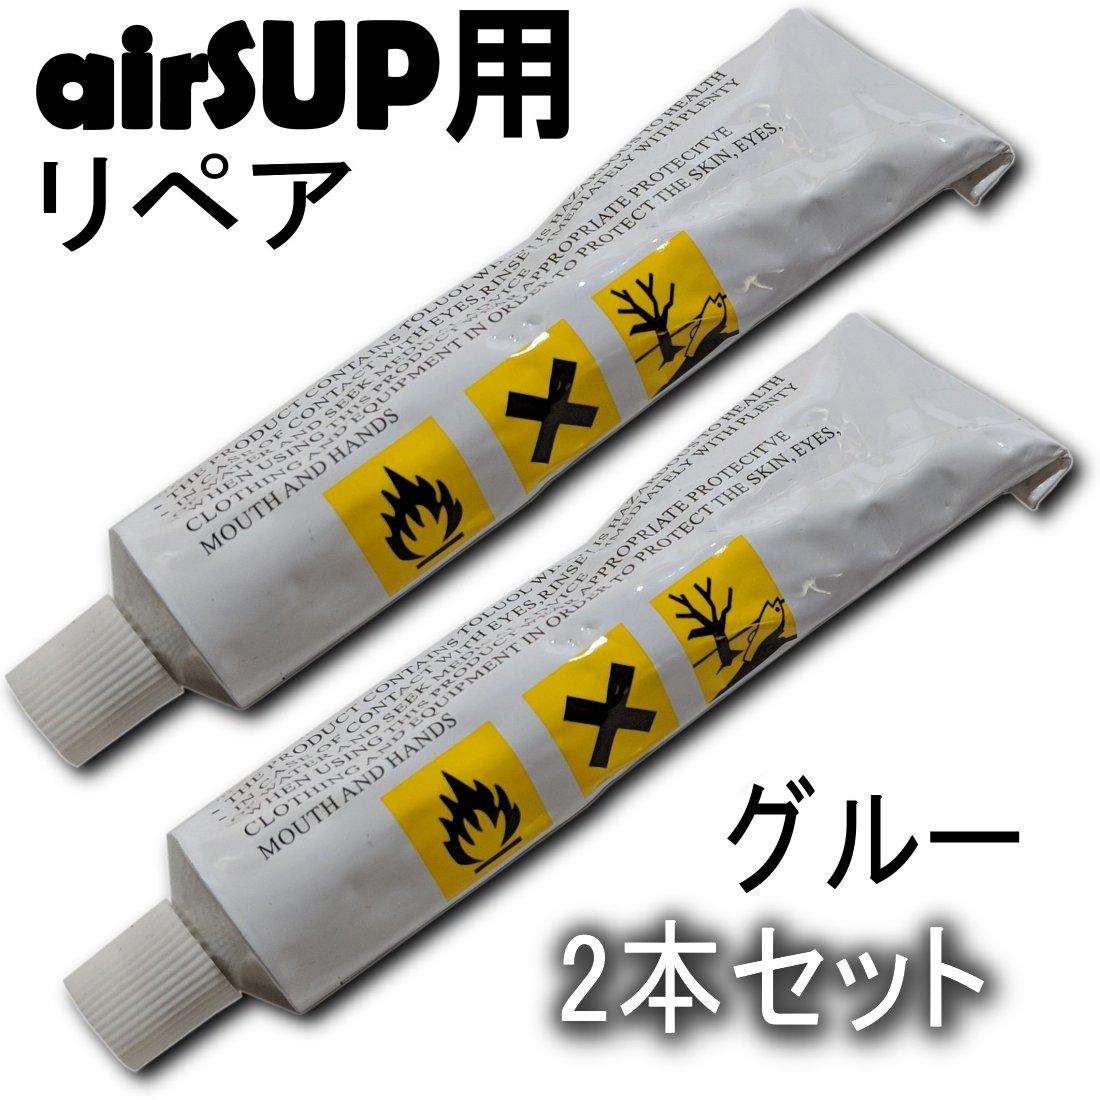 airSUP 修理・フィン・ボックス用のり 接着剤 グルー 説明書付き AIR7 純正品 x2